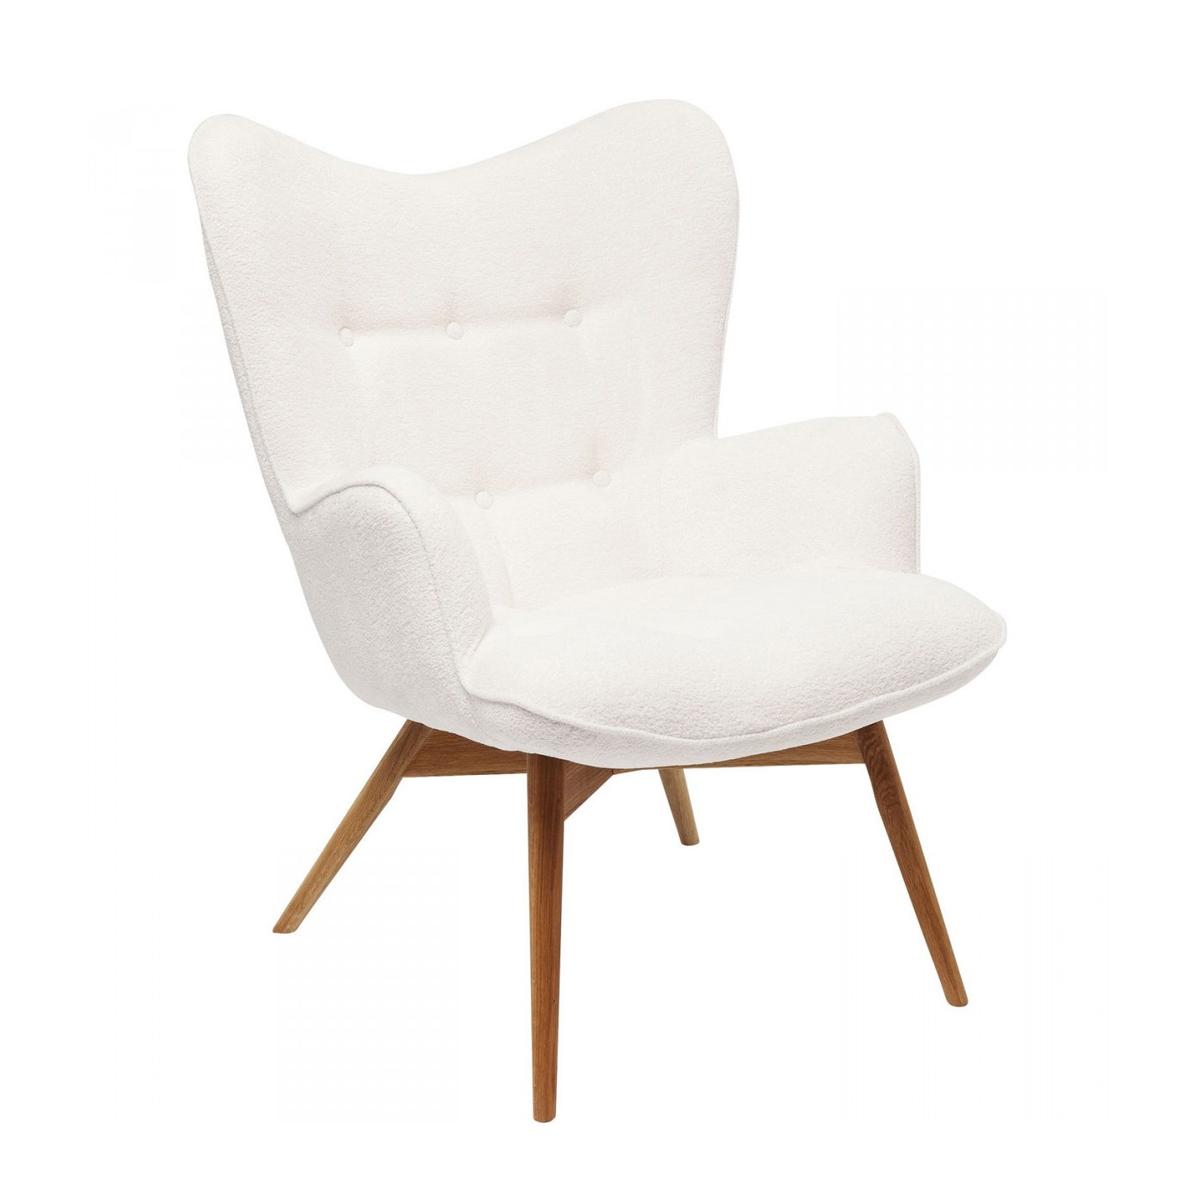 Witte Design Fauteuil.Witte Fauteuil